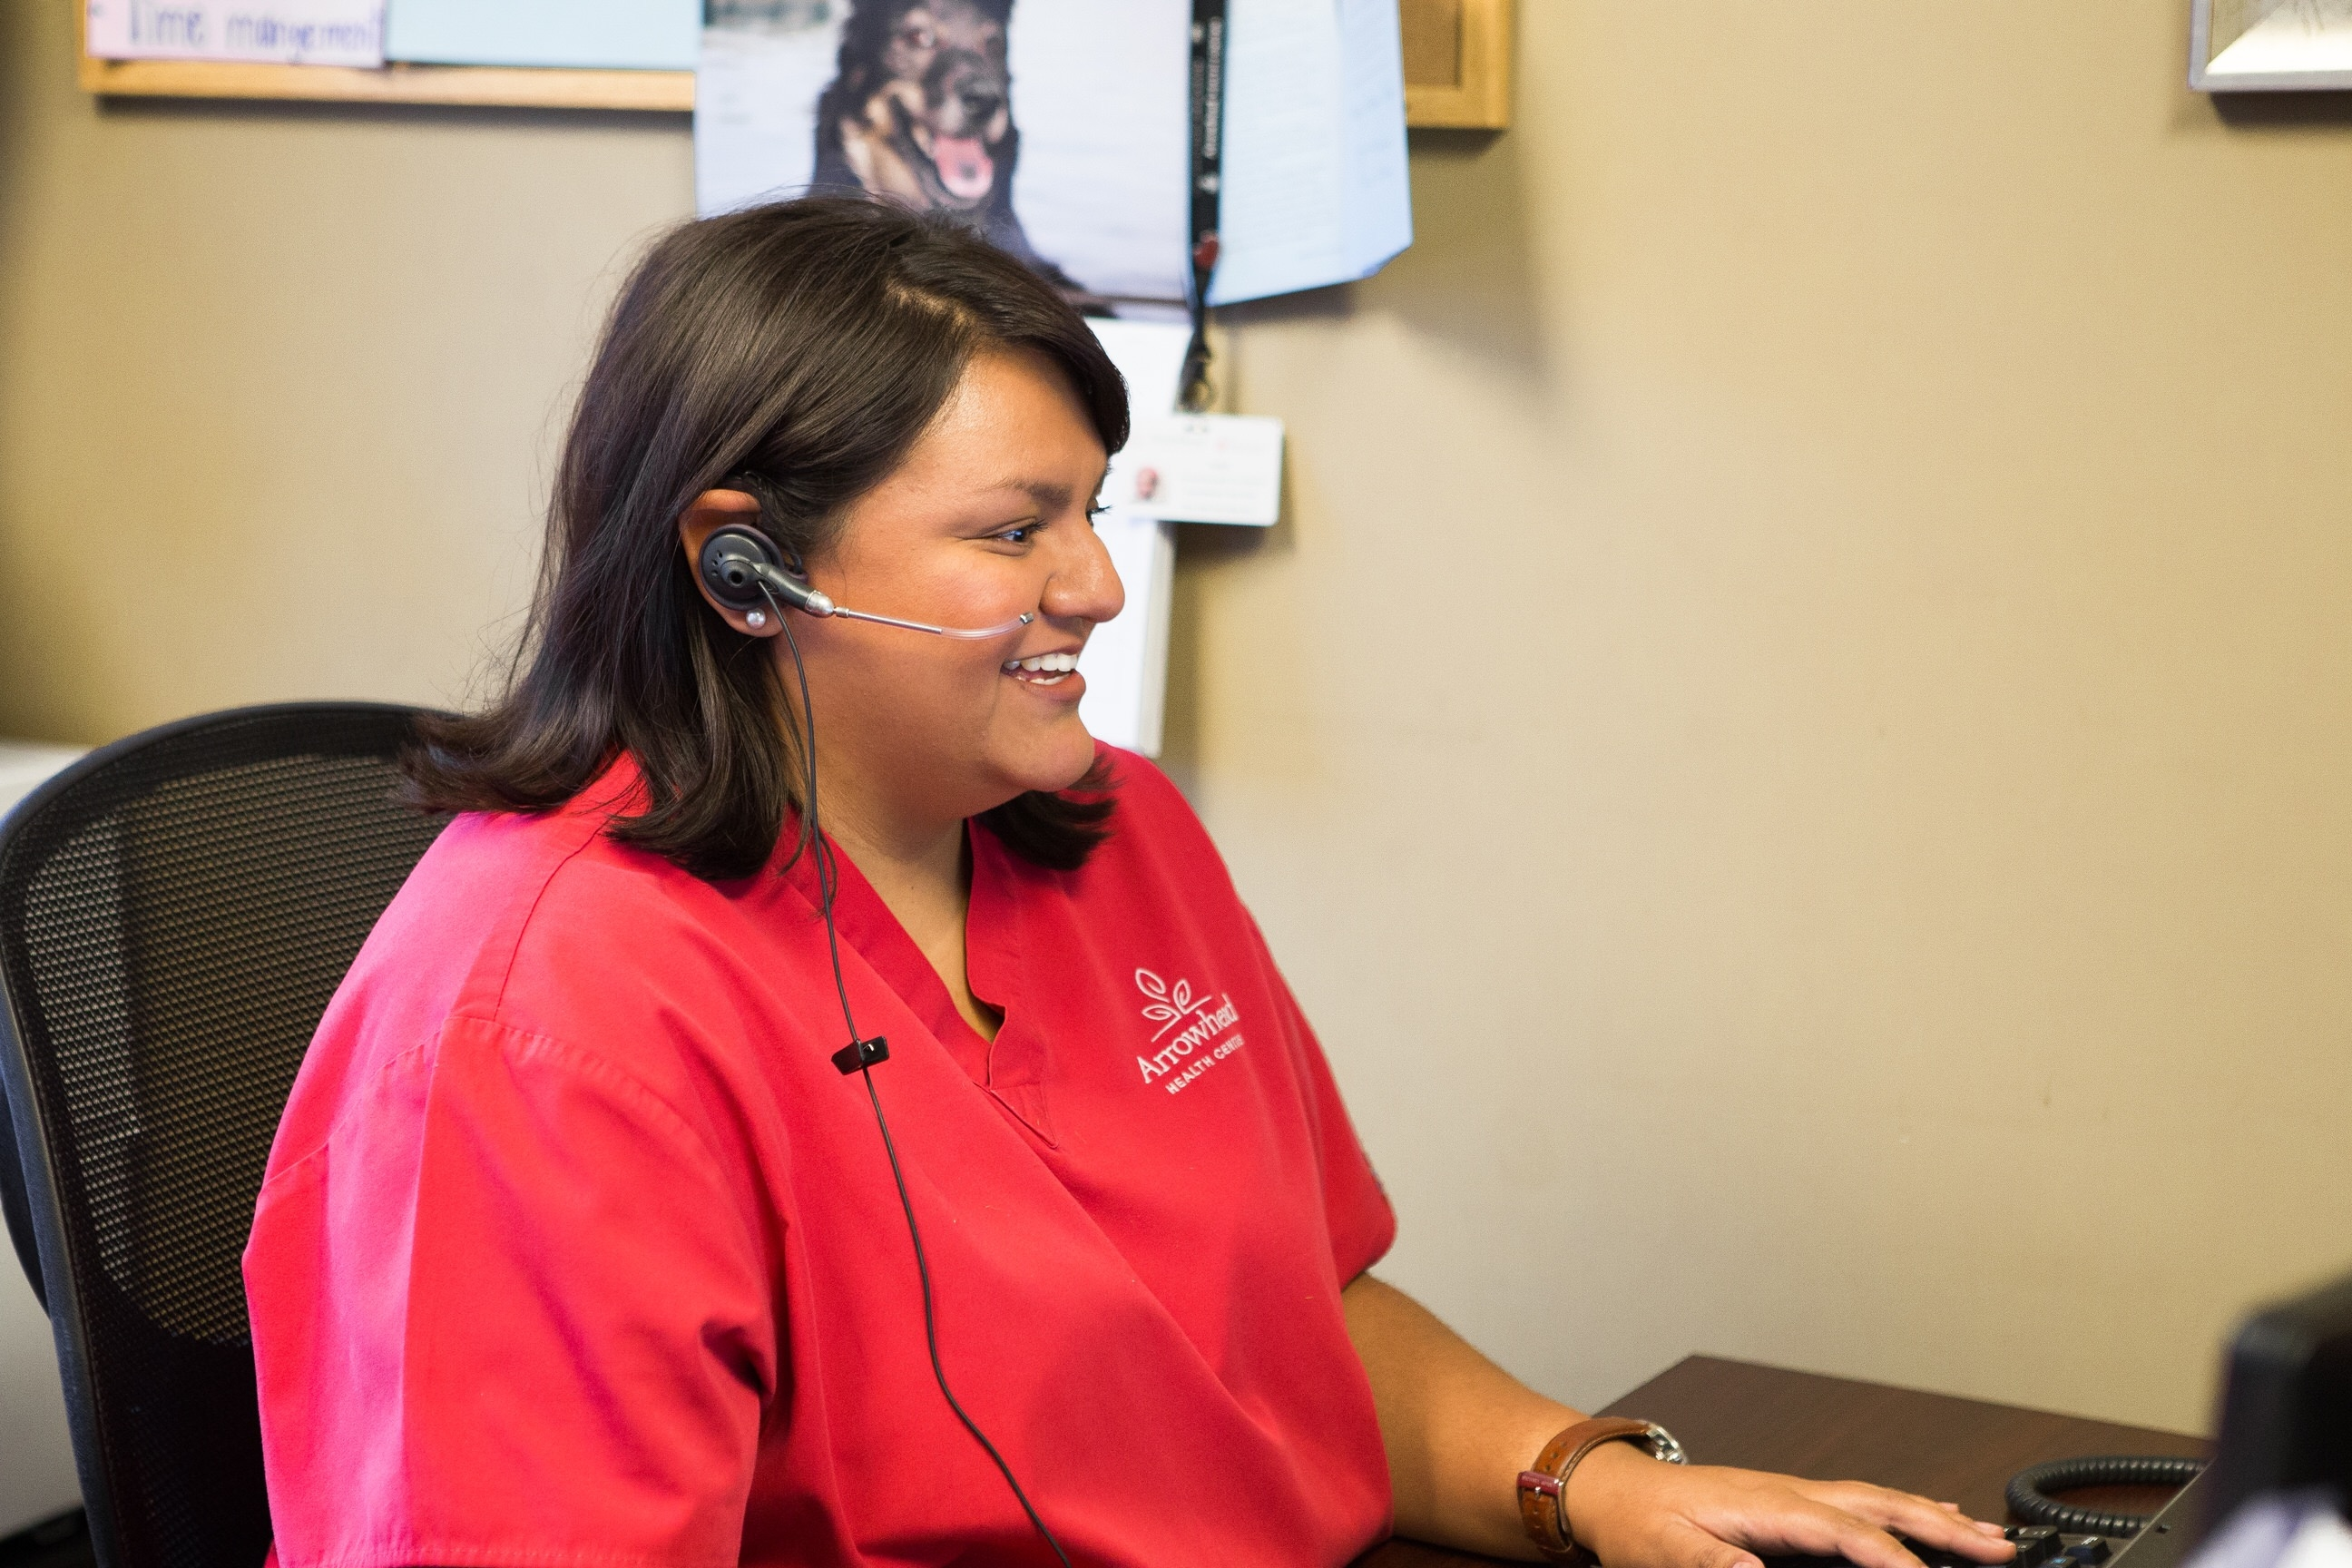 Arrowhead Health Centers image 7